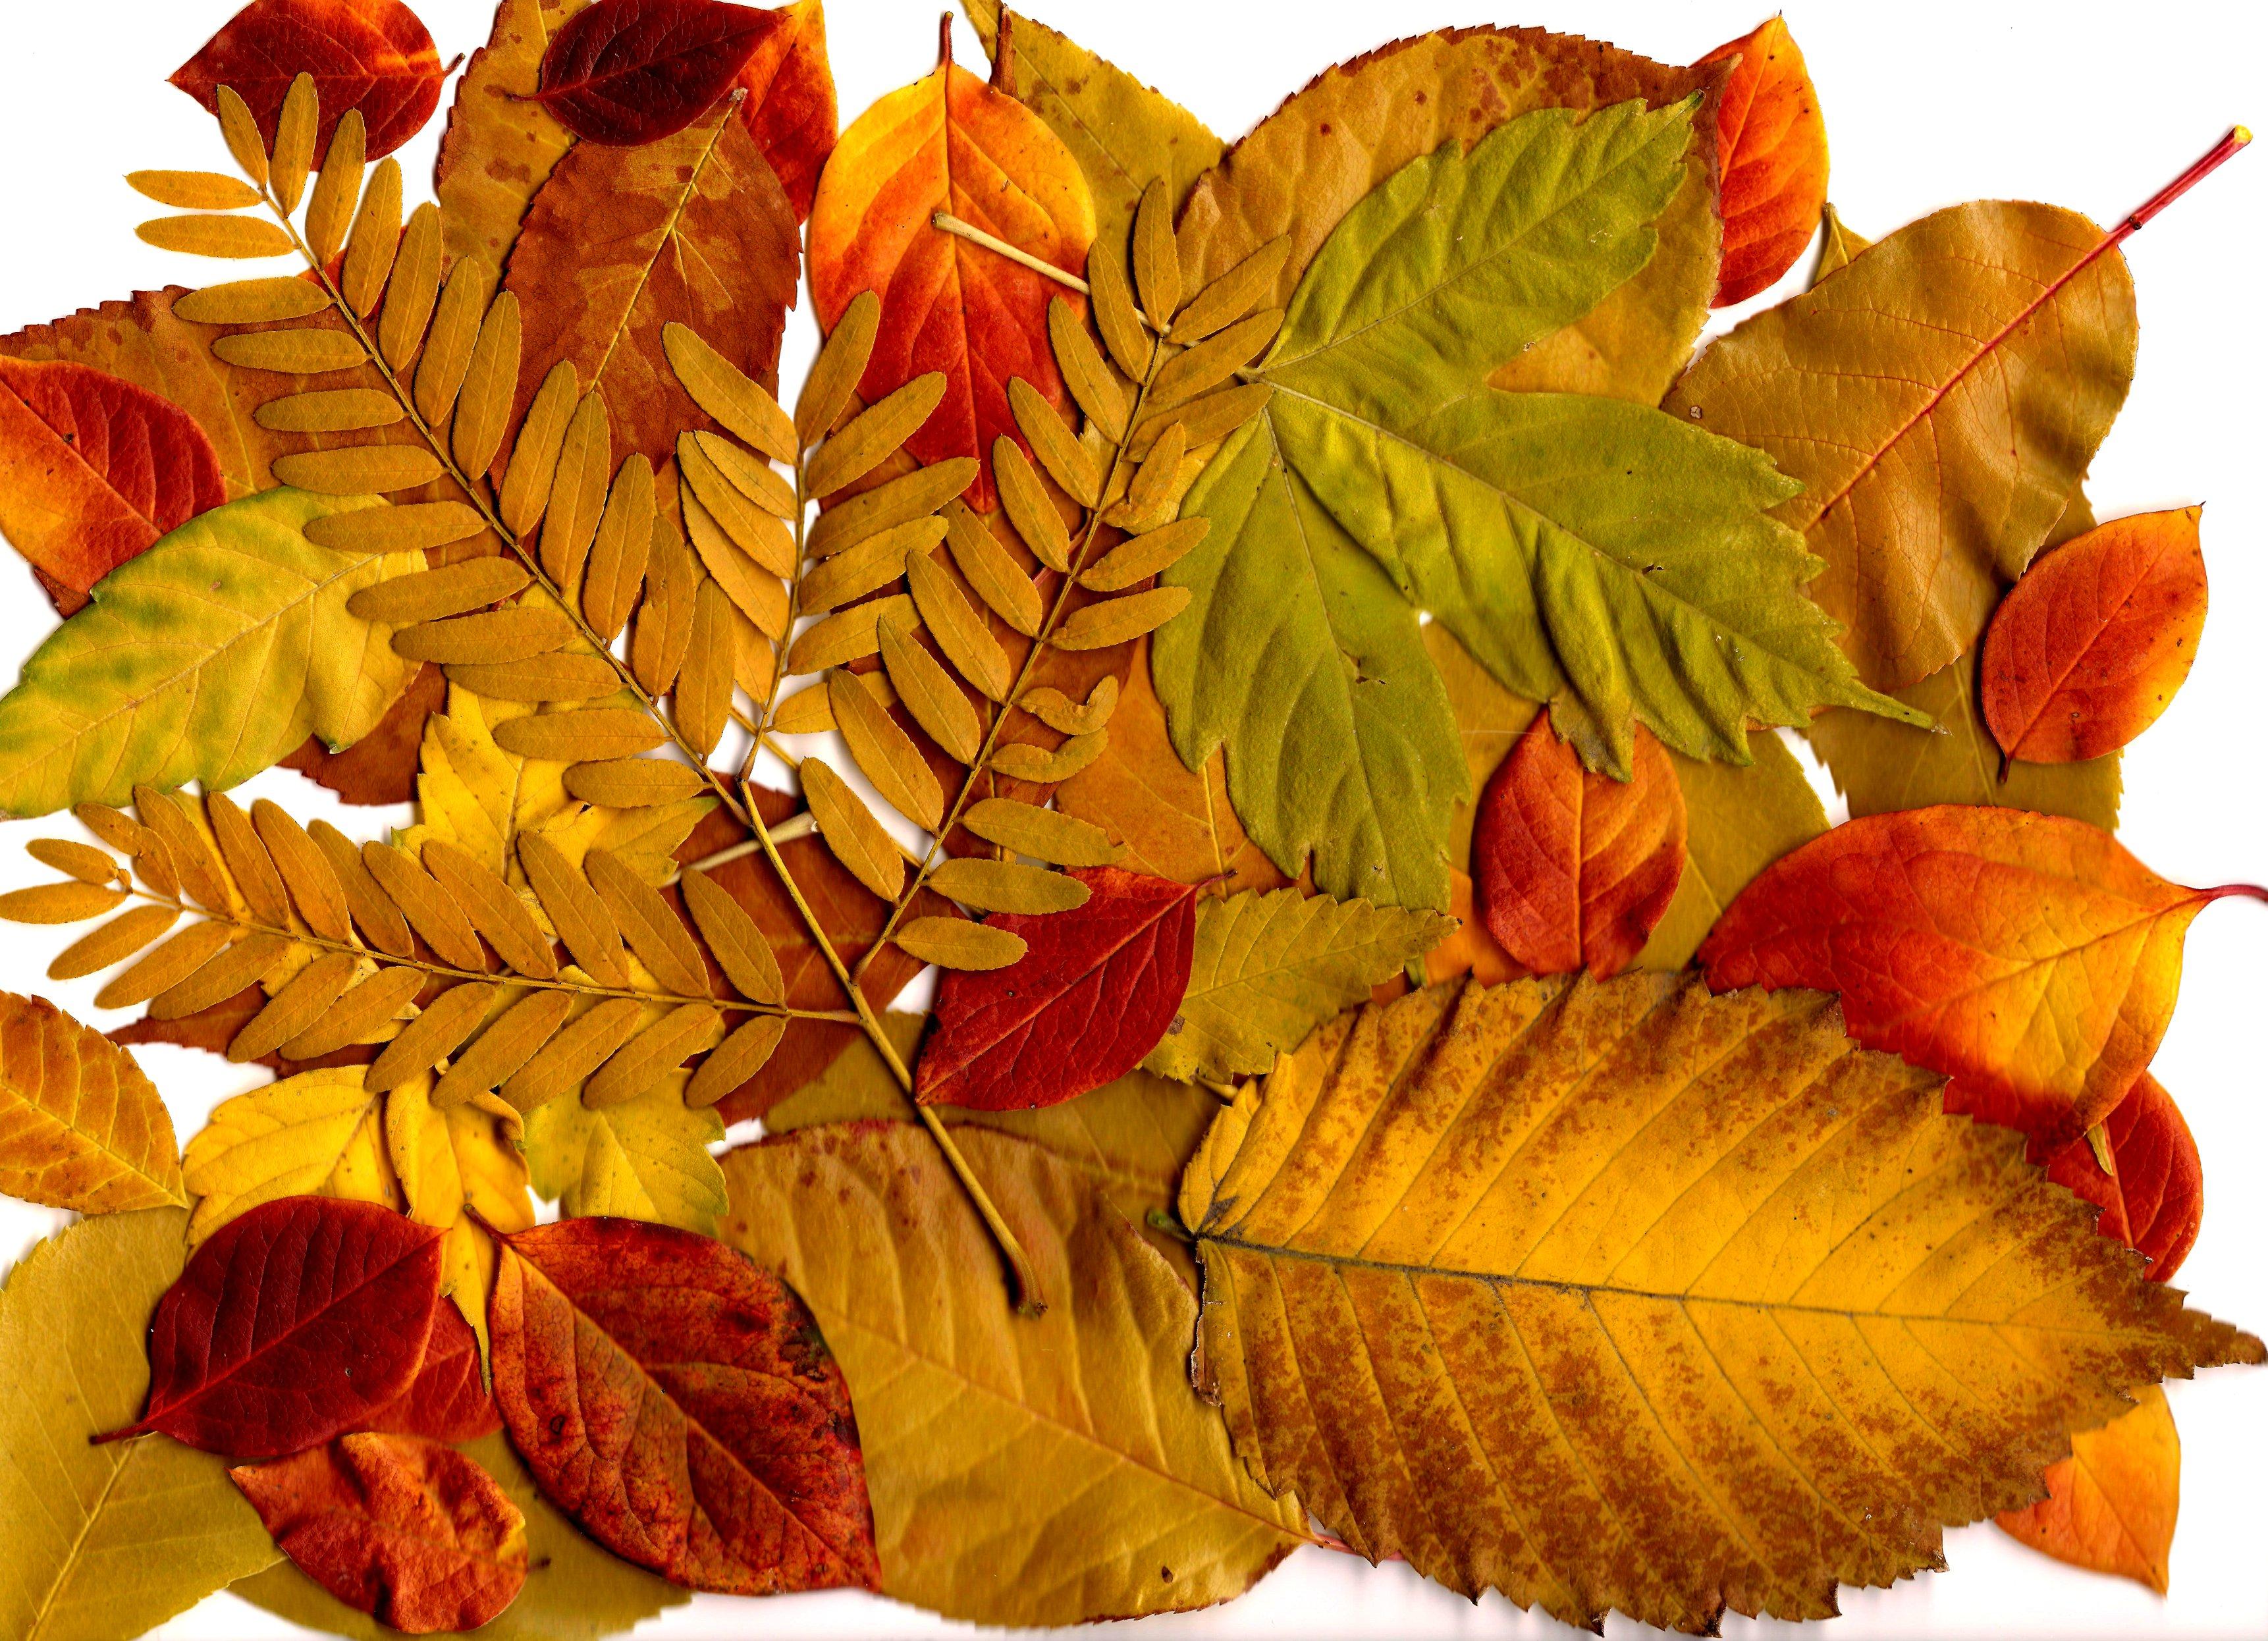 Autumn Leaves Collage Picture | Free Photograph | Photos Public Domain